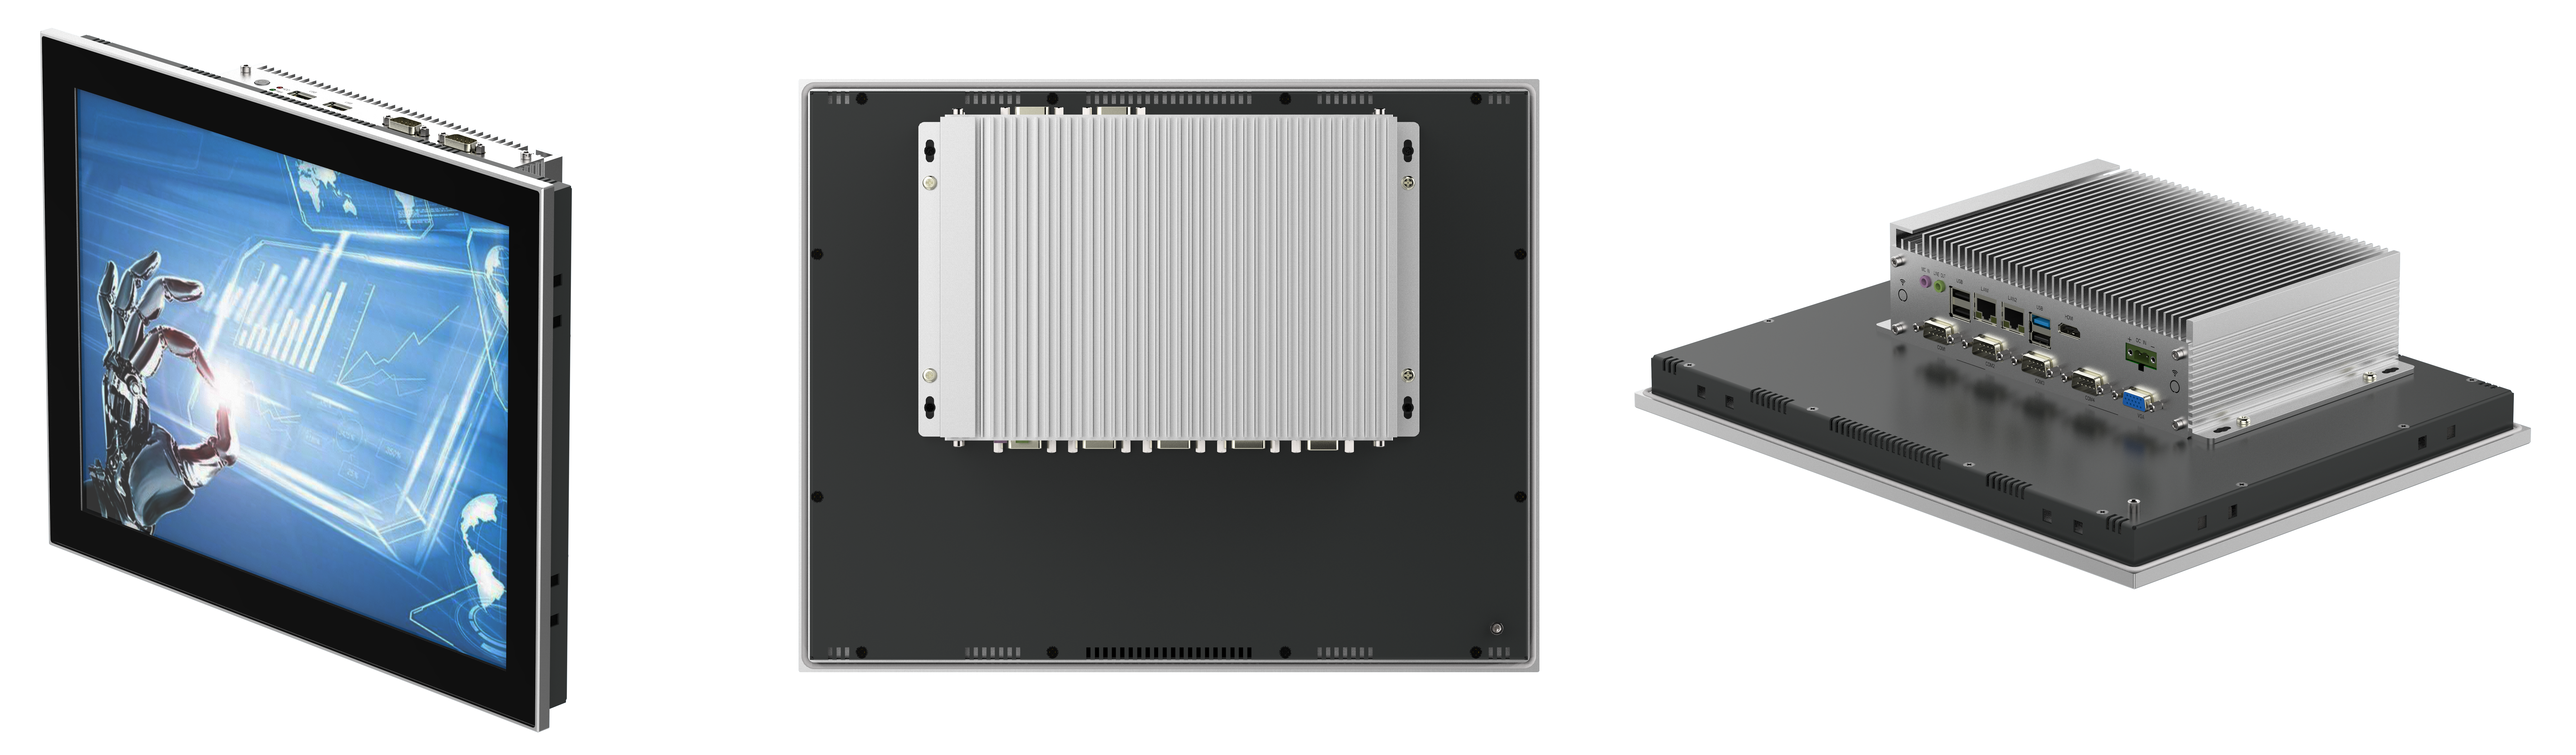 CDS industiral panel PC range